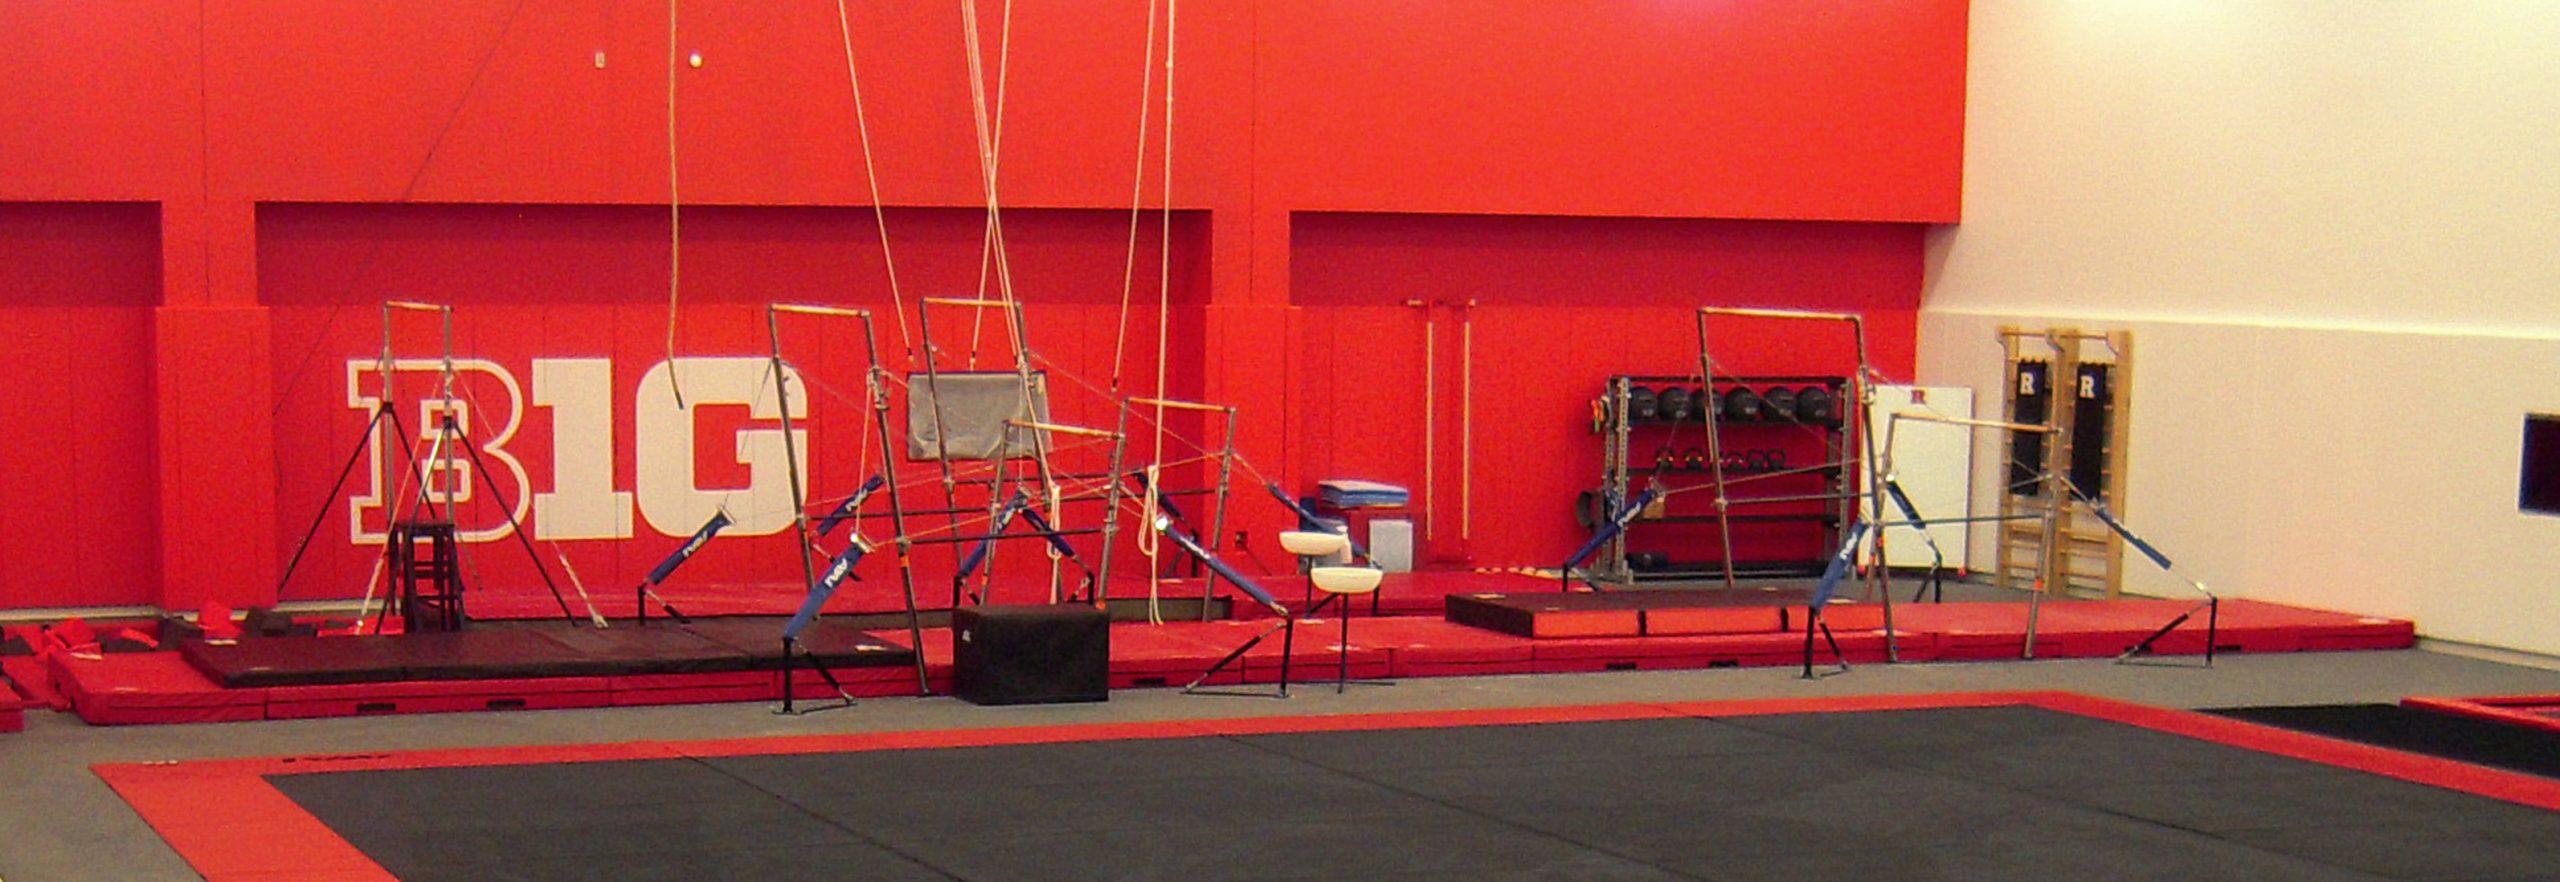 Rutgers Gymnastics beam & trampoline area.